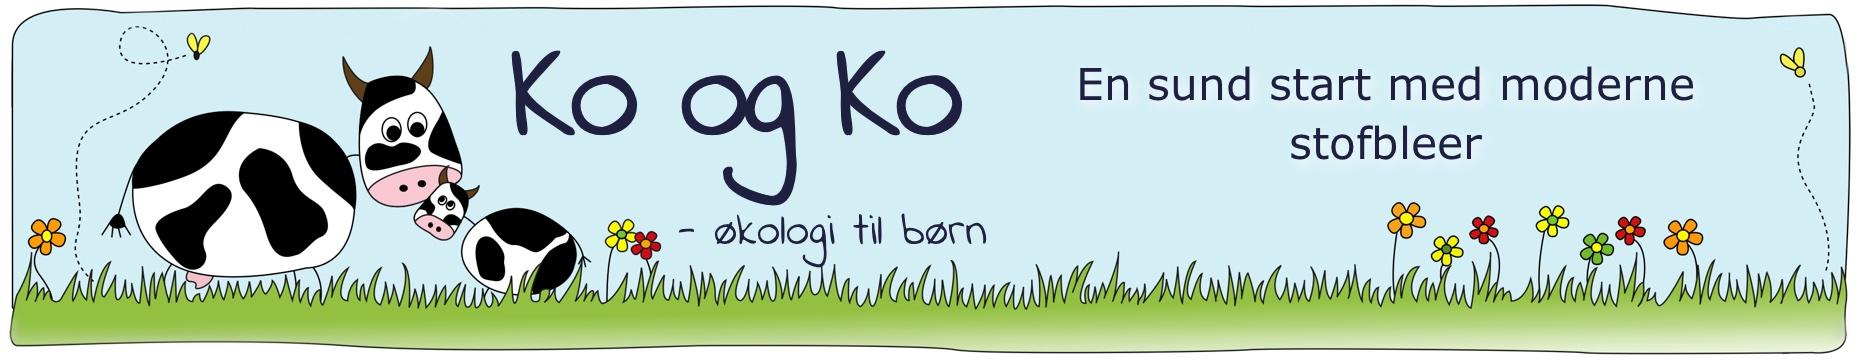 Koogko